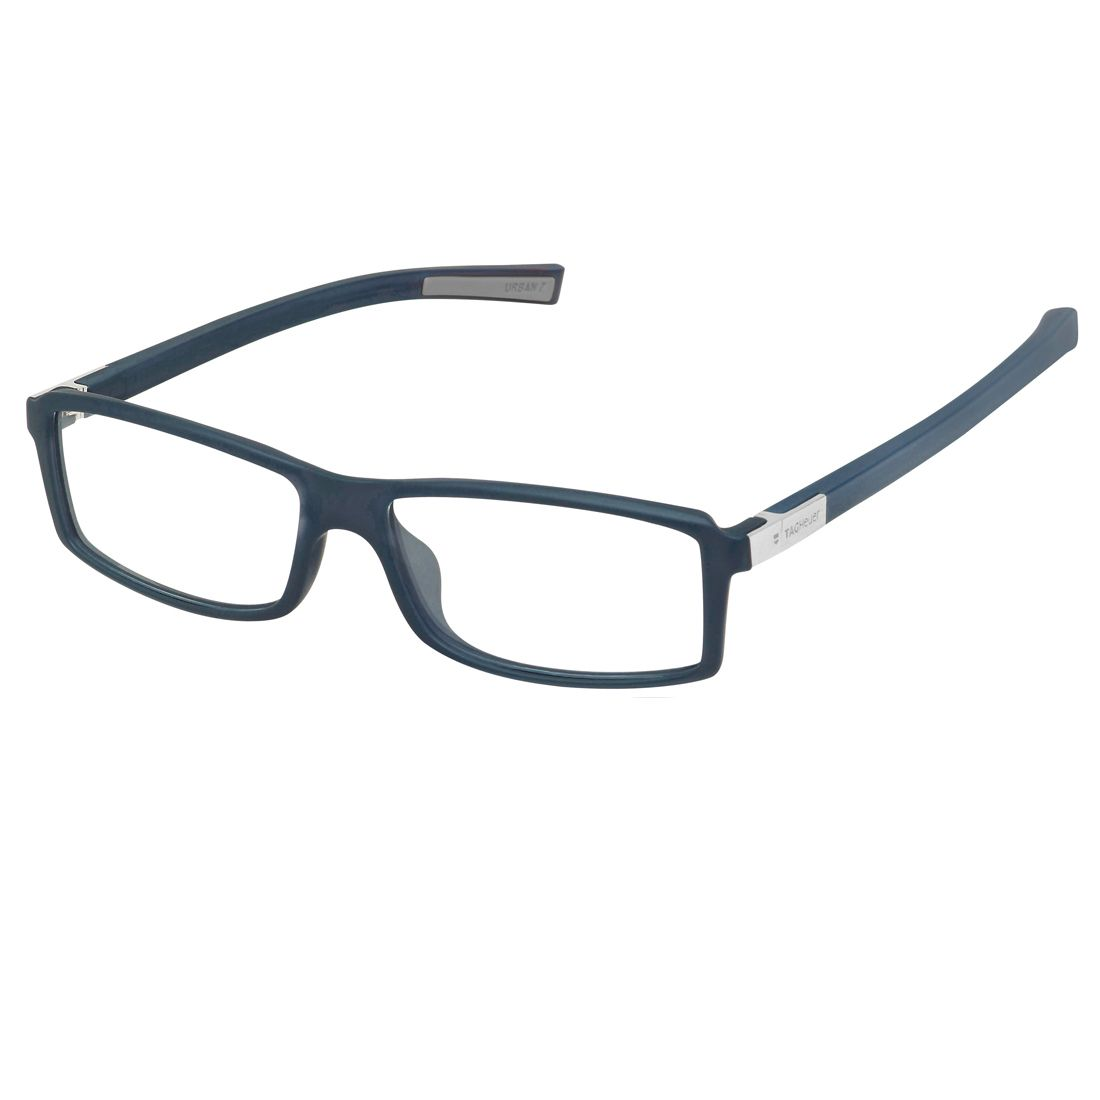 a47d666ba3 TAG Heuer 0513 Urban 7 Eyeglasses Matte Blue Grey 007